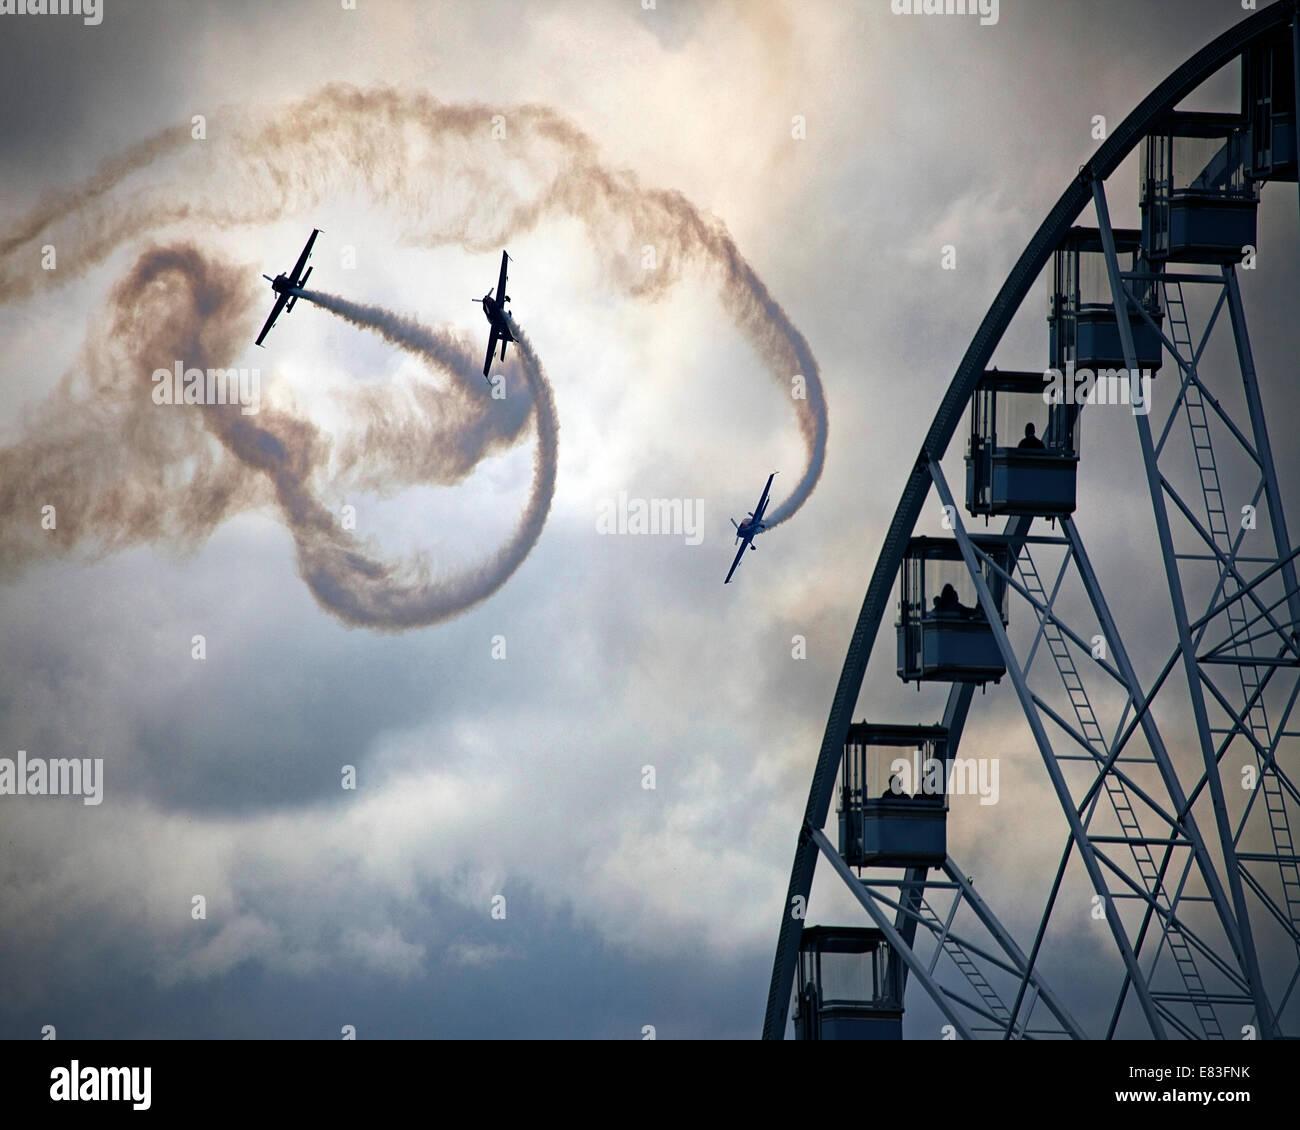 GB - DEVON: Blades Aerobatic Display Team performing over Torquay's Riviera Wheel - Stock Image